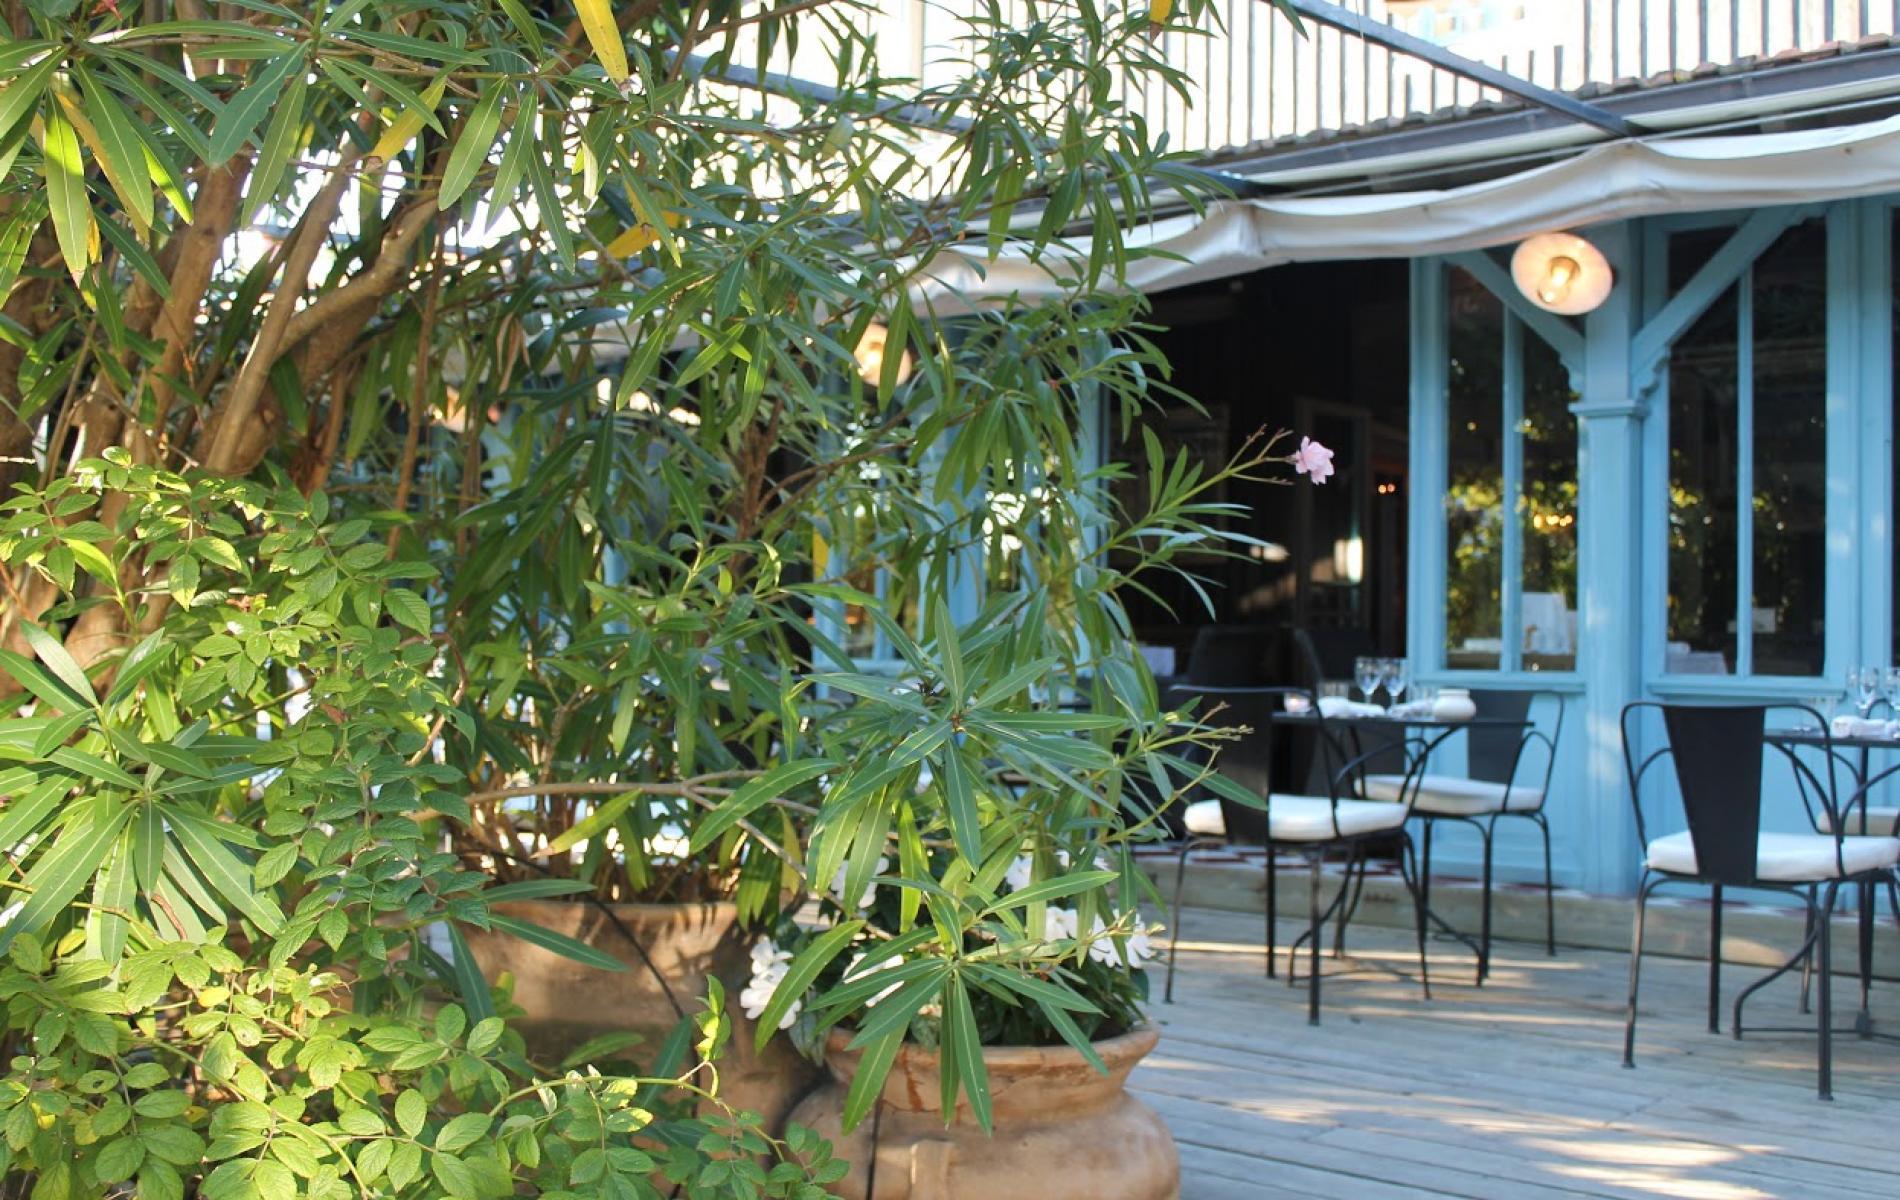 Pictures gallery of la maison du bassin hotel in cap ferret - La maison du bassin cap ferret ...